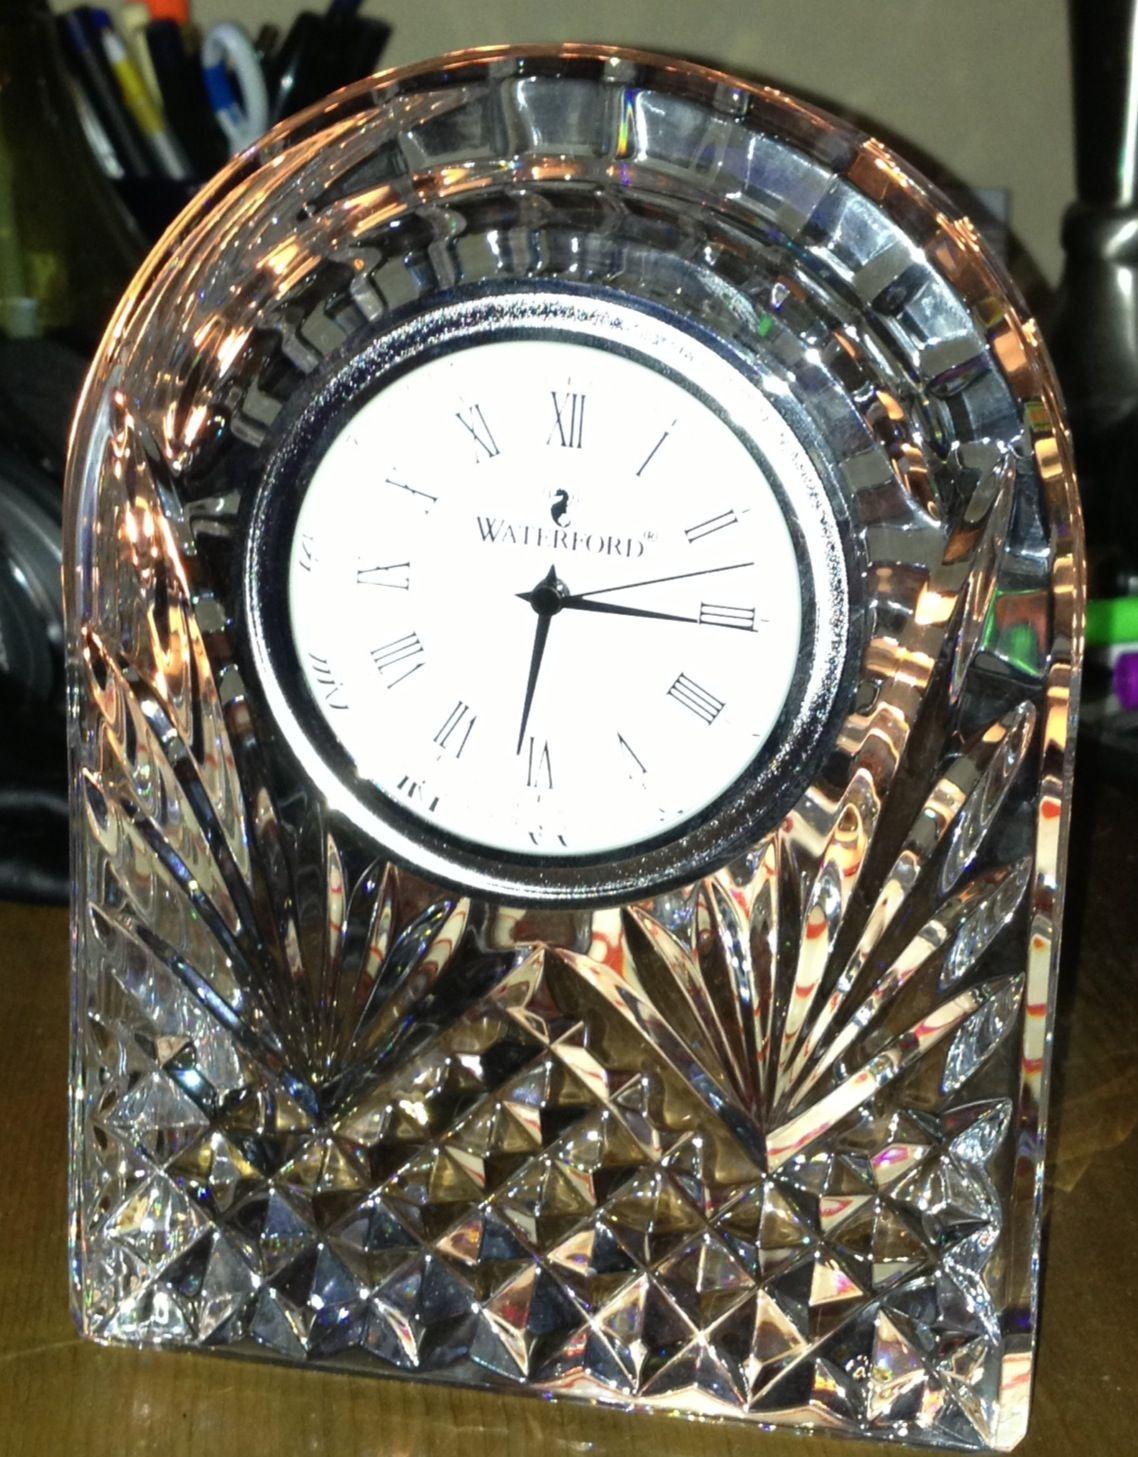 Waterford Crystal Clocks Clock